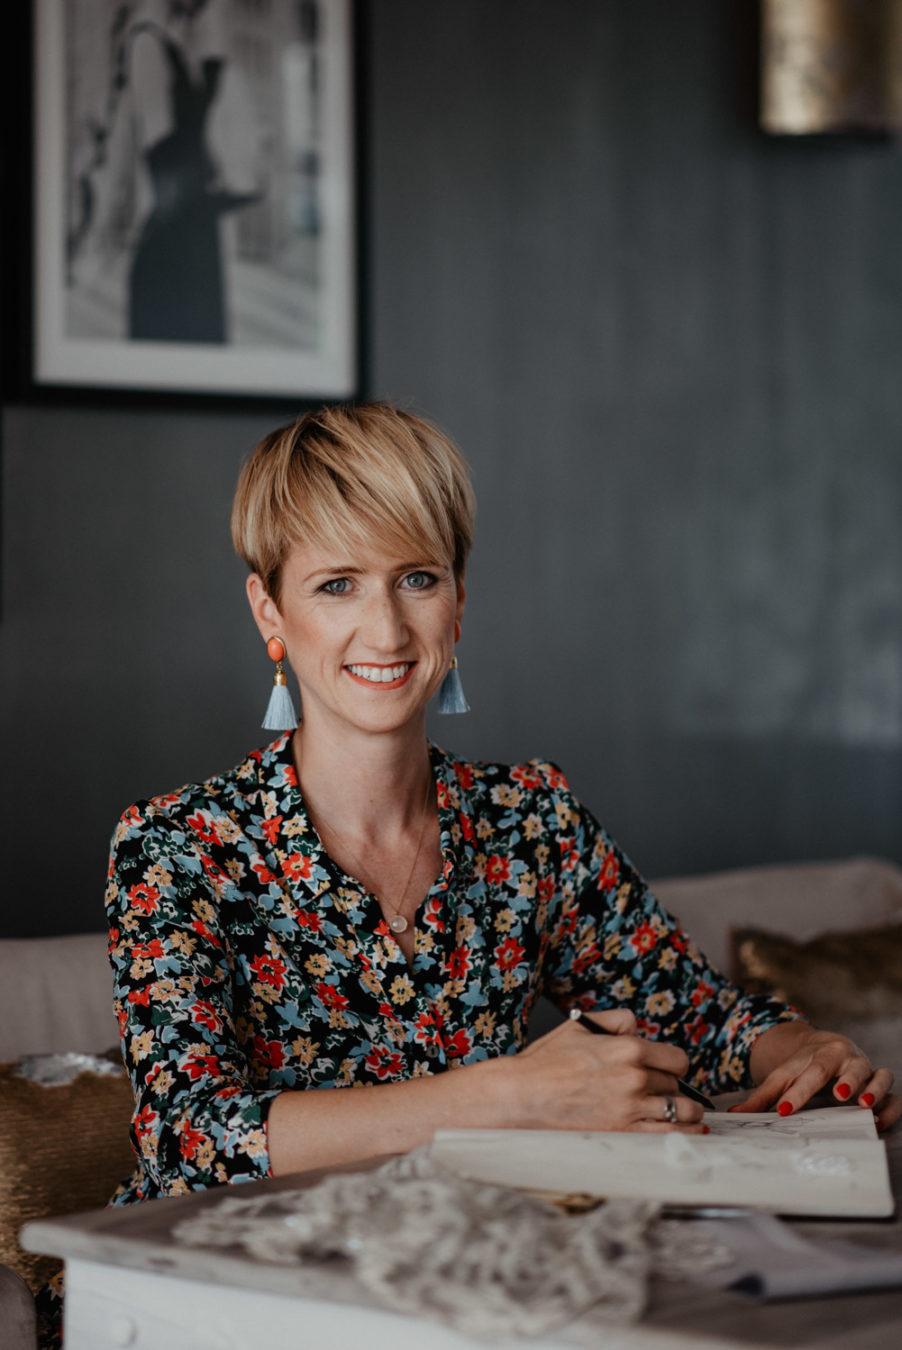 Lifestyleshooting Businessbilder Portraitfotografin Grafikdesign Heidelberg Pfalz Juliane Finkenberger